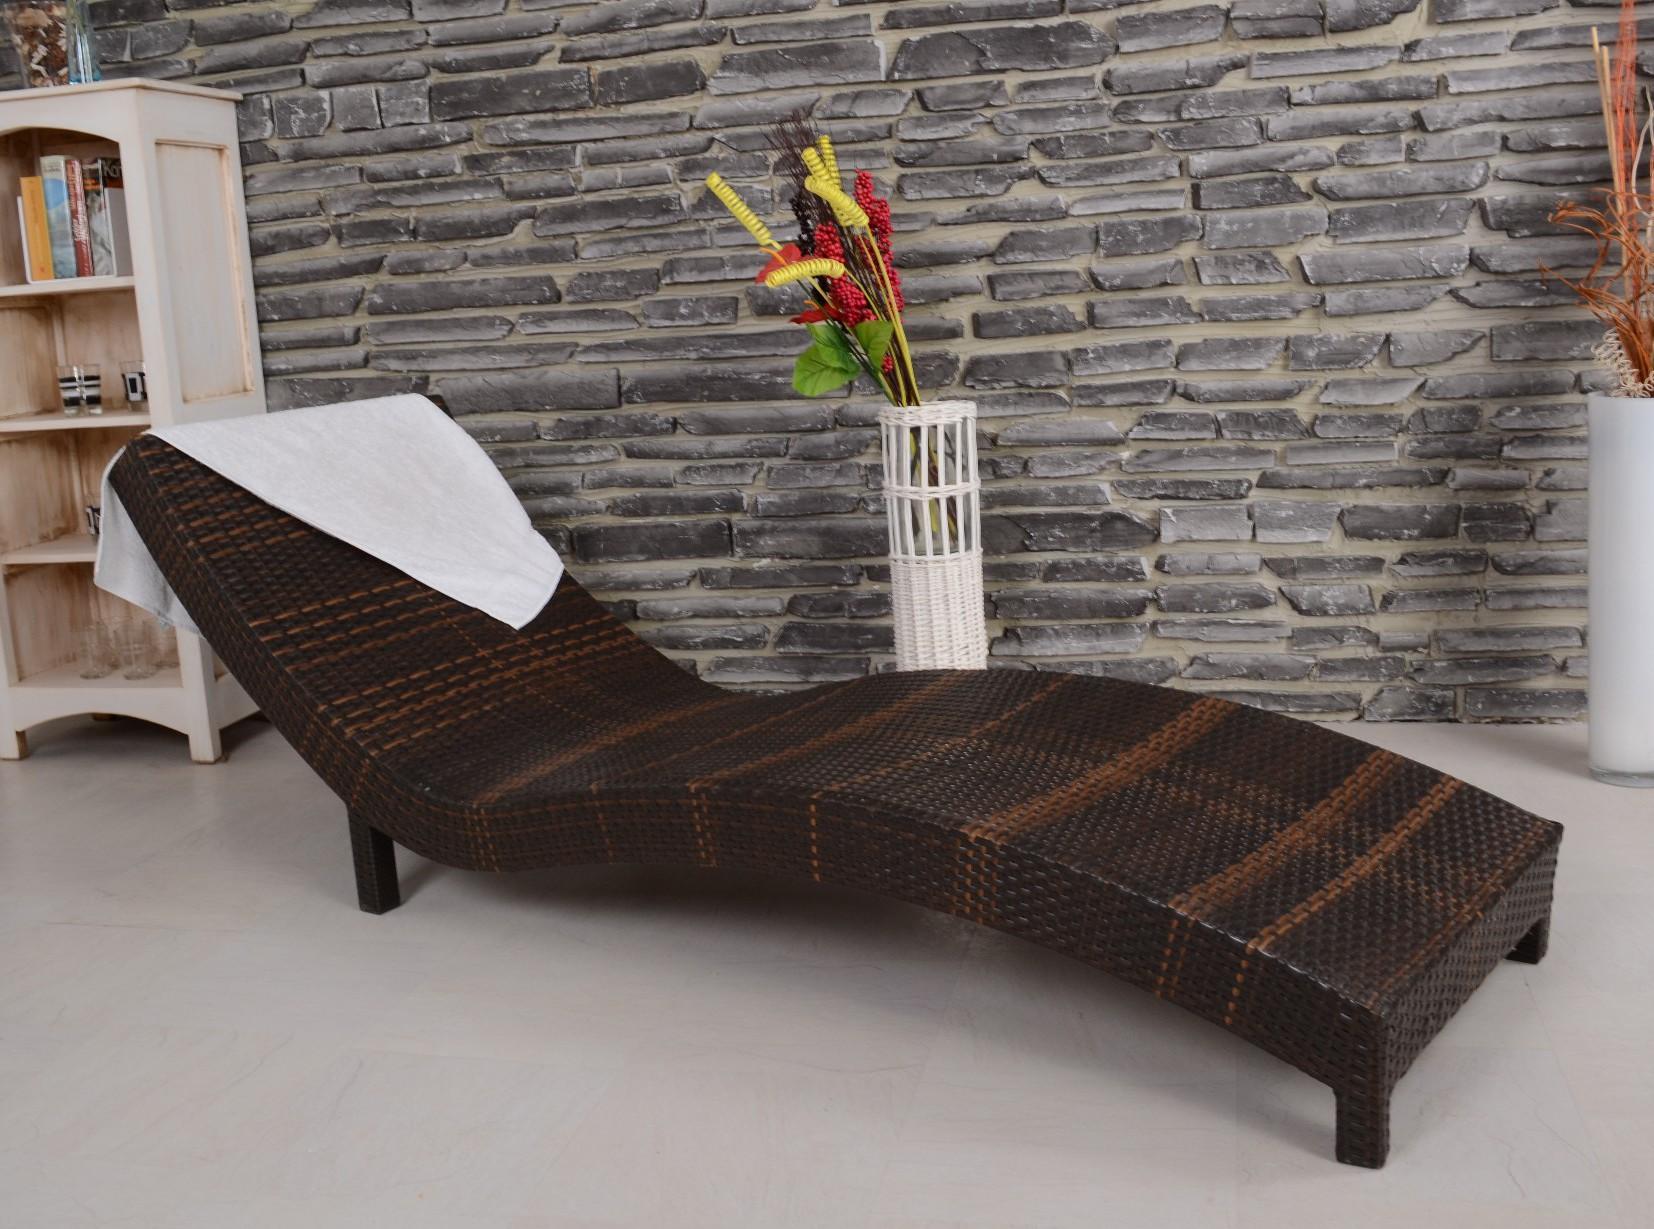 loungegarnitur mehr als 20 angebote fotos preise. Black Bedroom Furniture Sets. Home Design Ideas